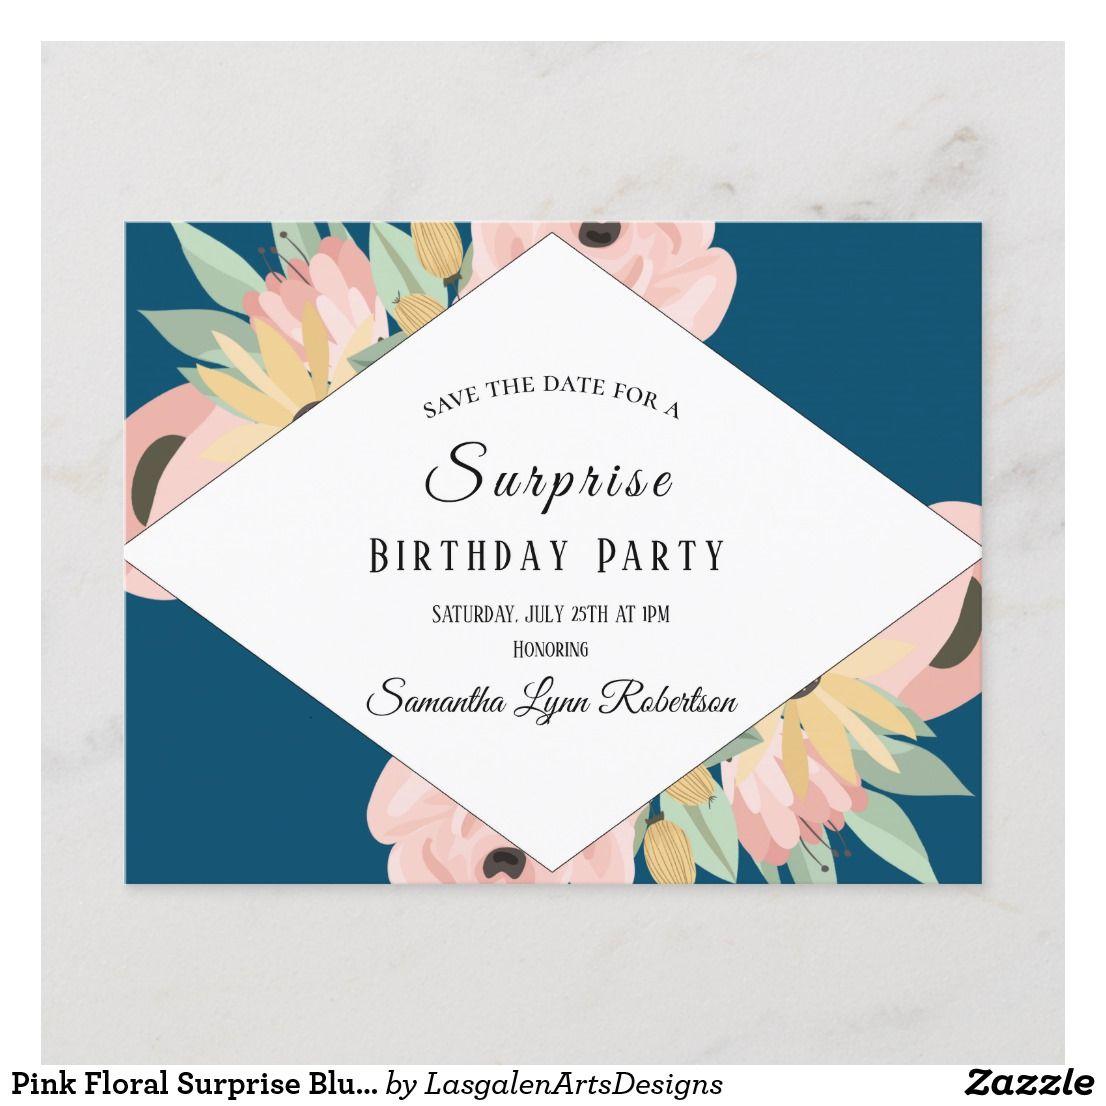 Pink Floral Surprise Blue Surprise Birthday Invitation